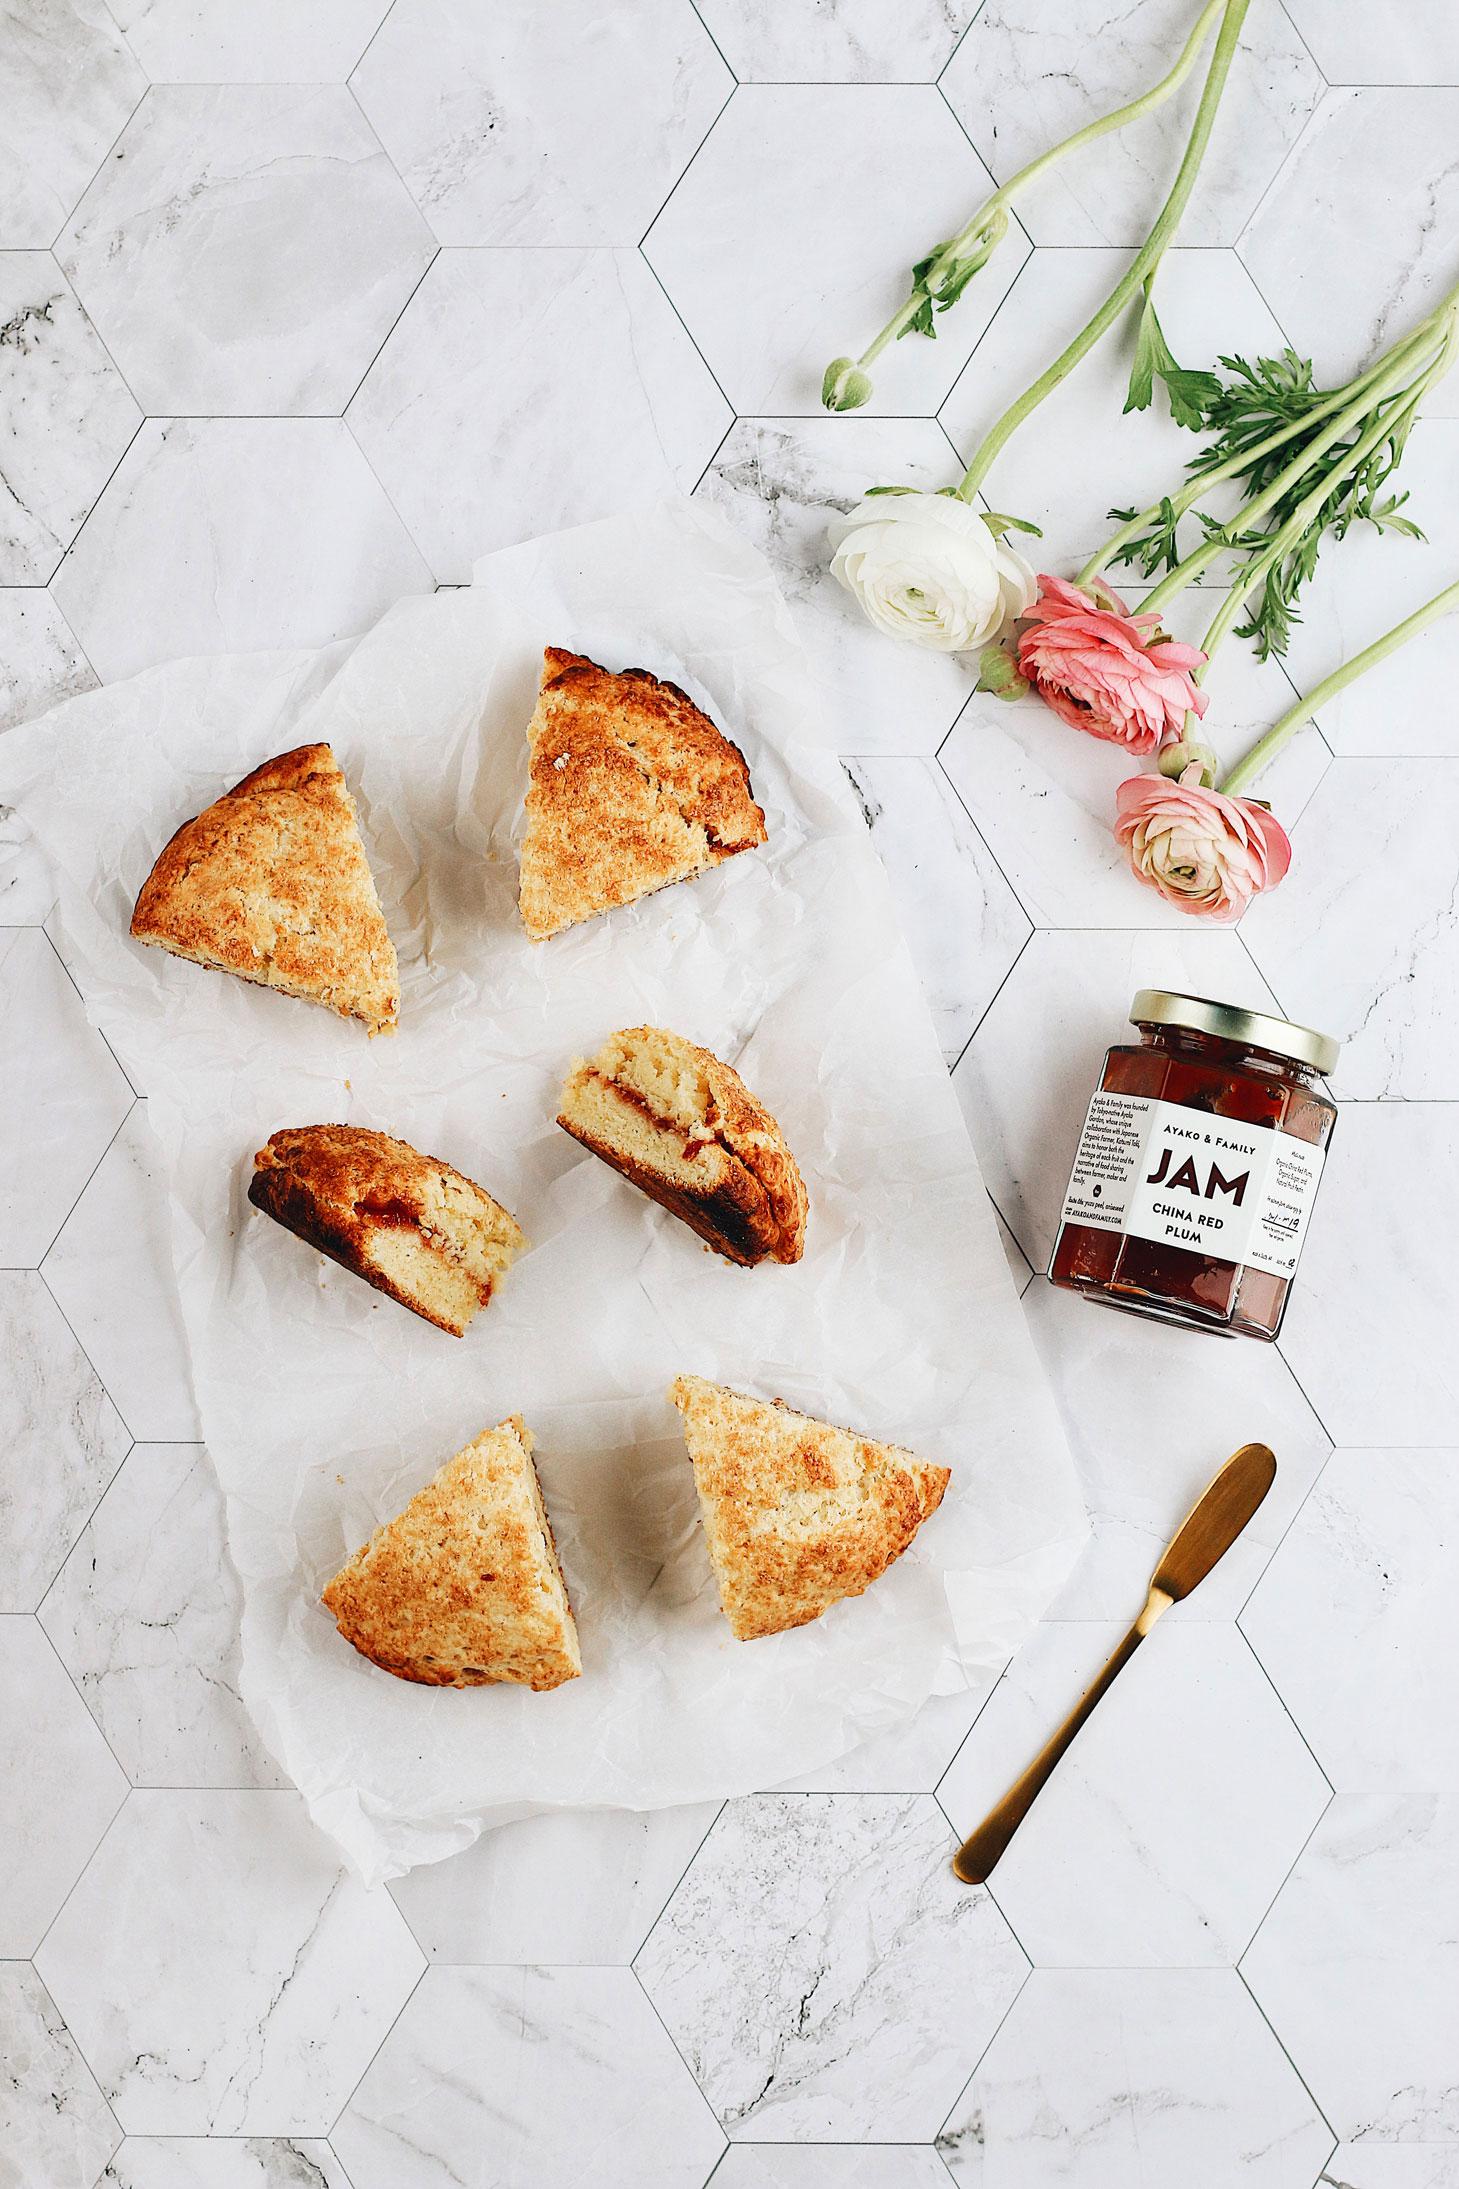 jam-filled-scone-kate-wood